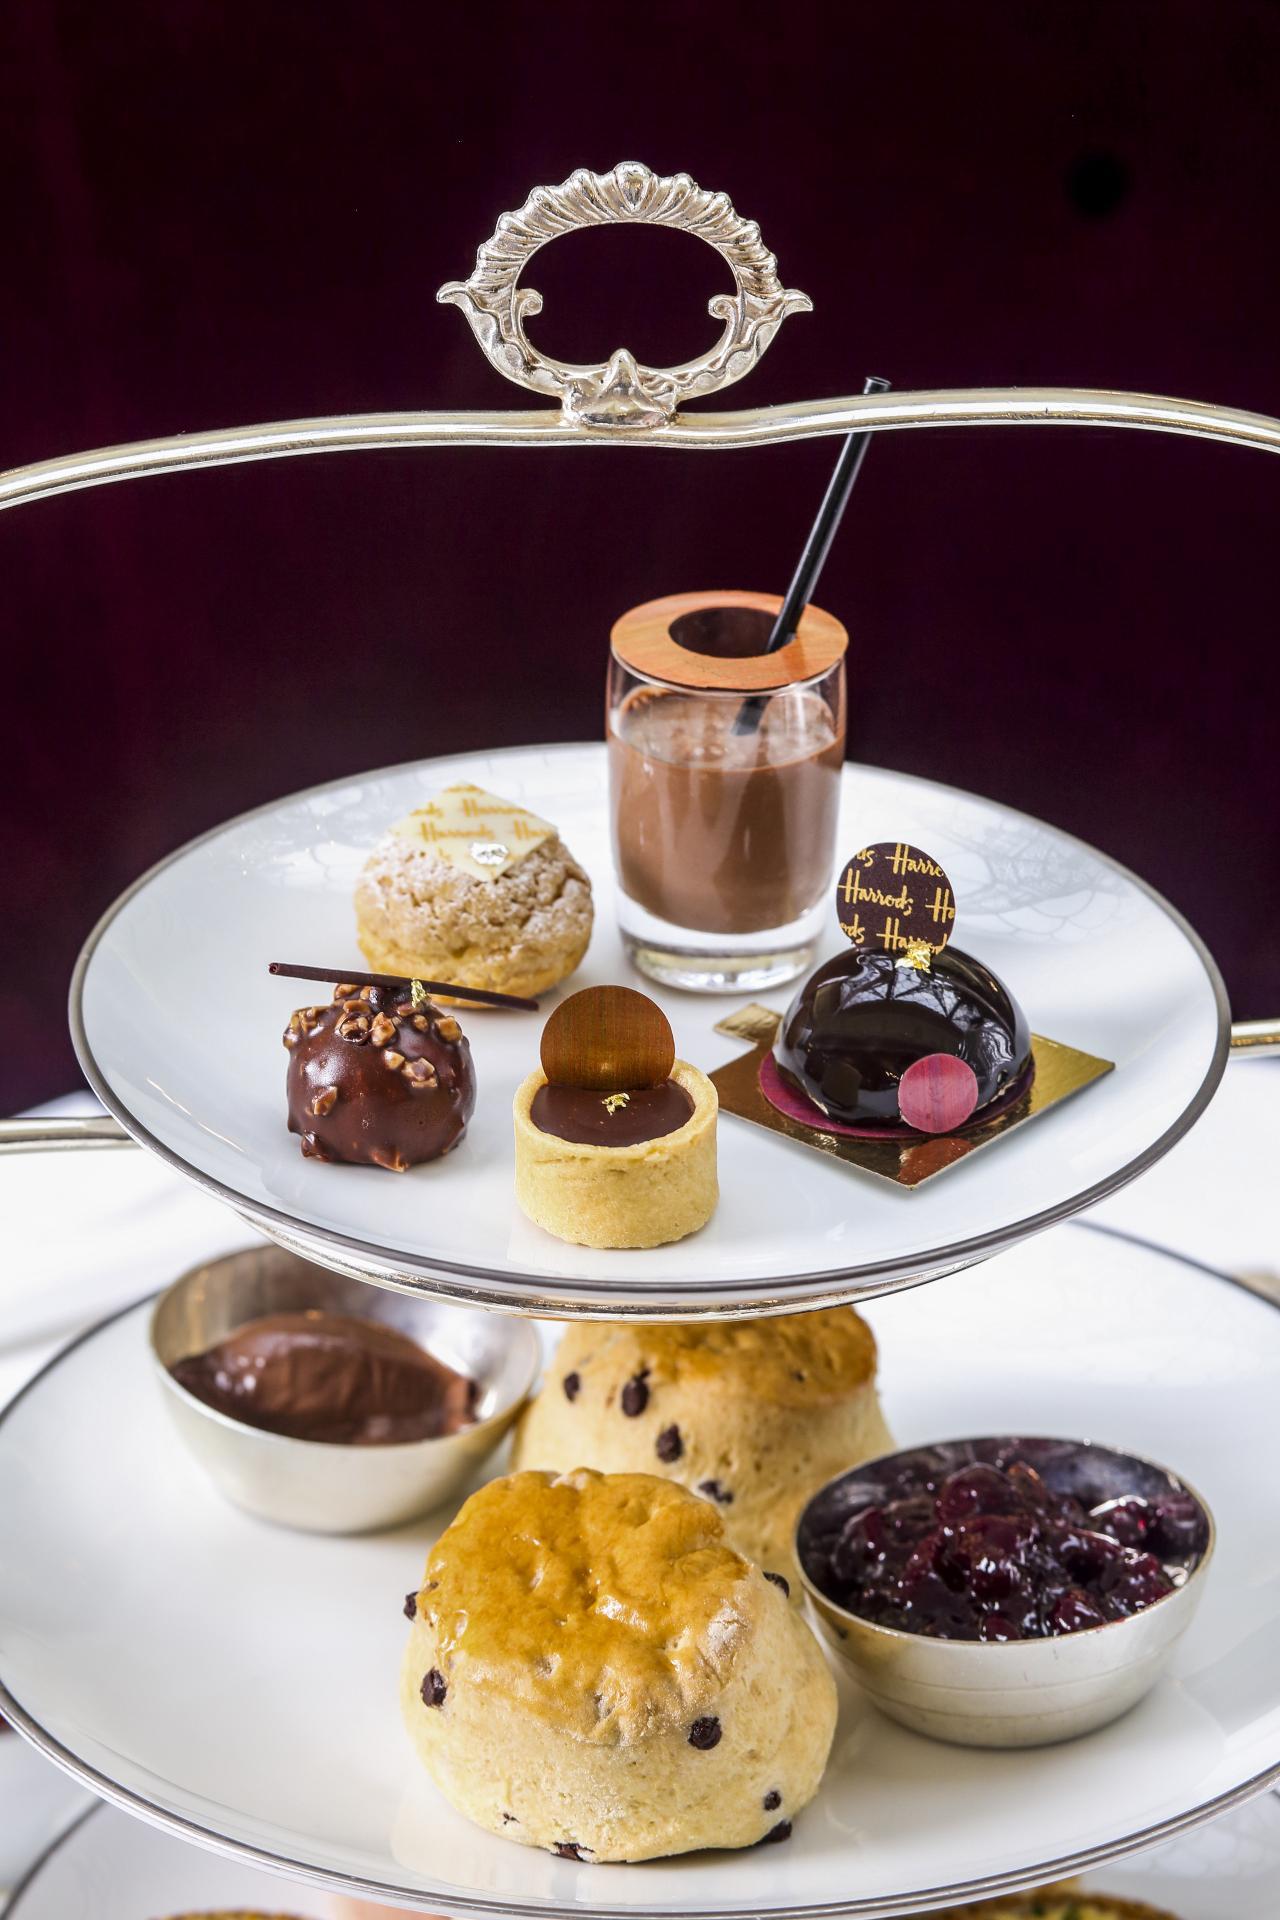 The Harrods Chocolate Afternoon Tea